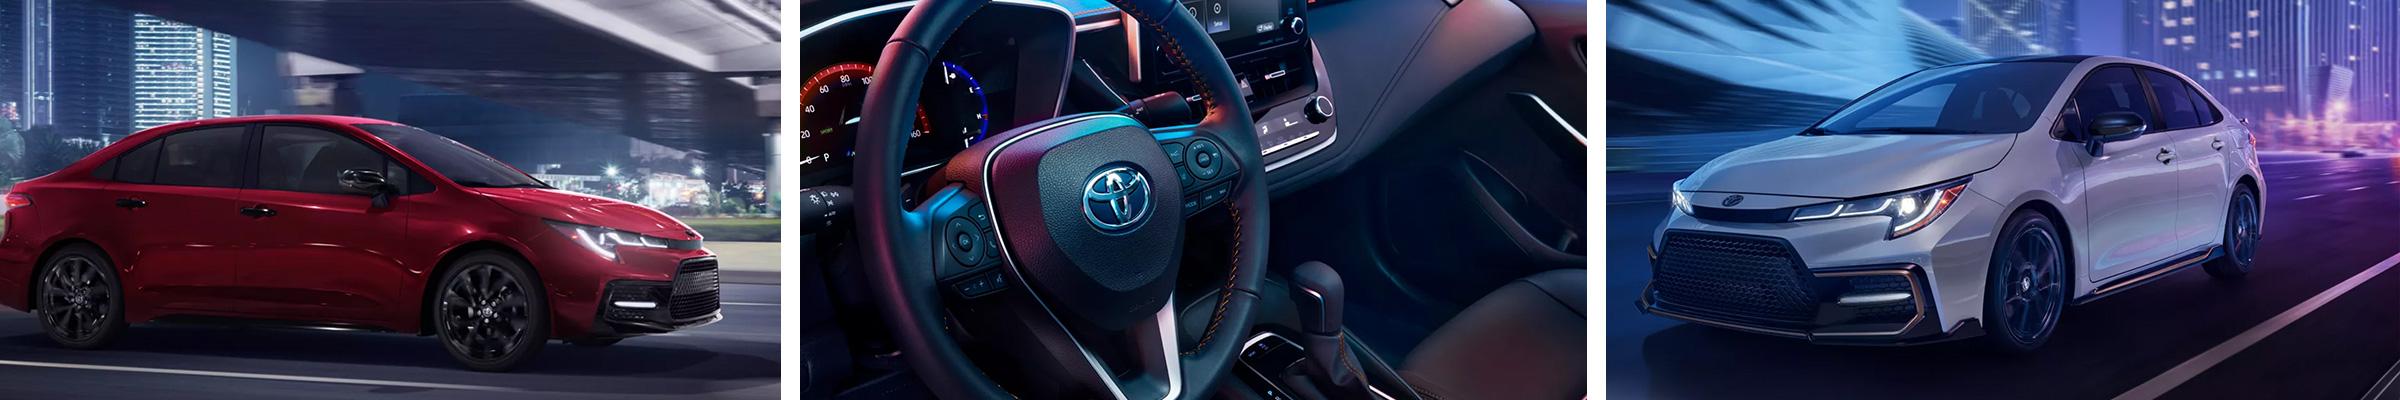 2022 Toyota Corolla For Sale Savannah GA   Chatham County